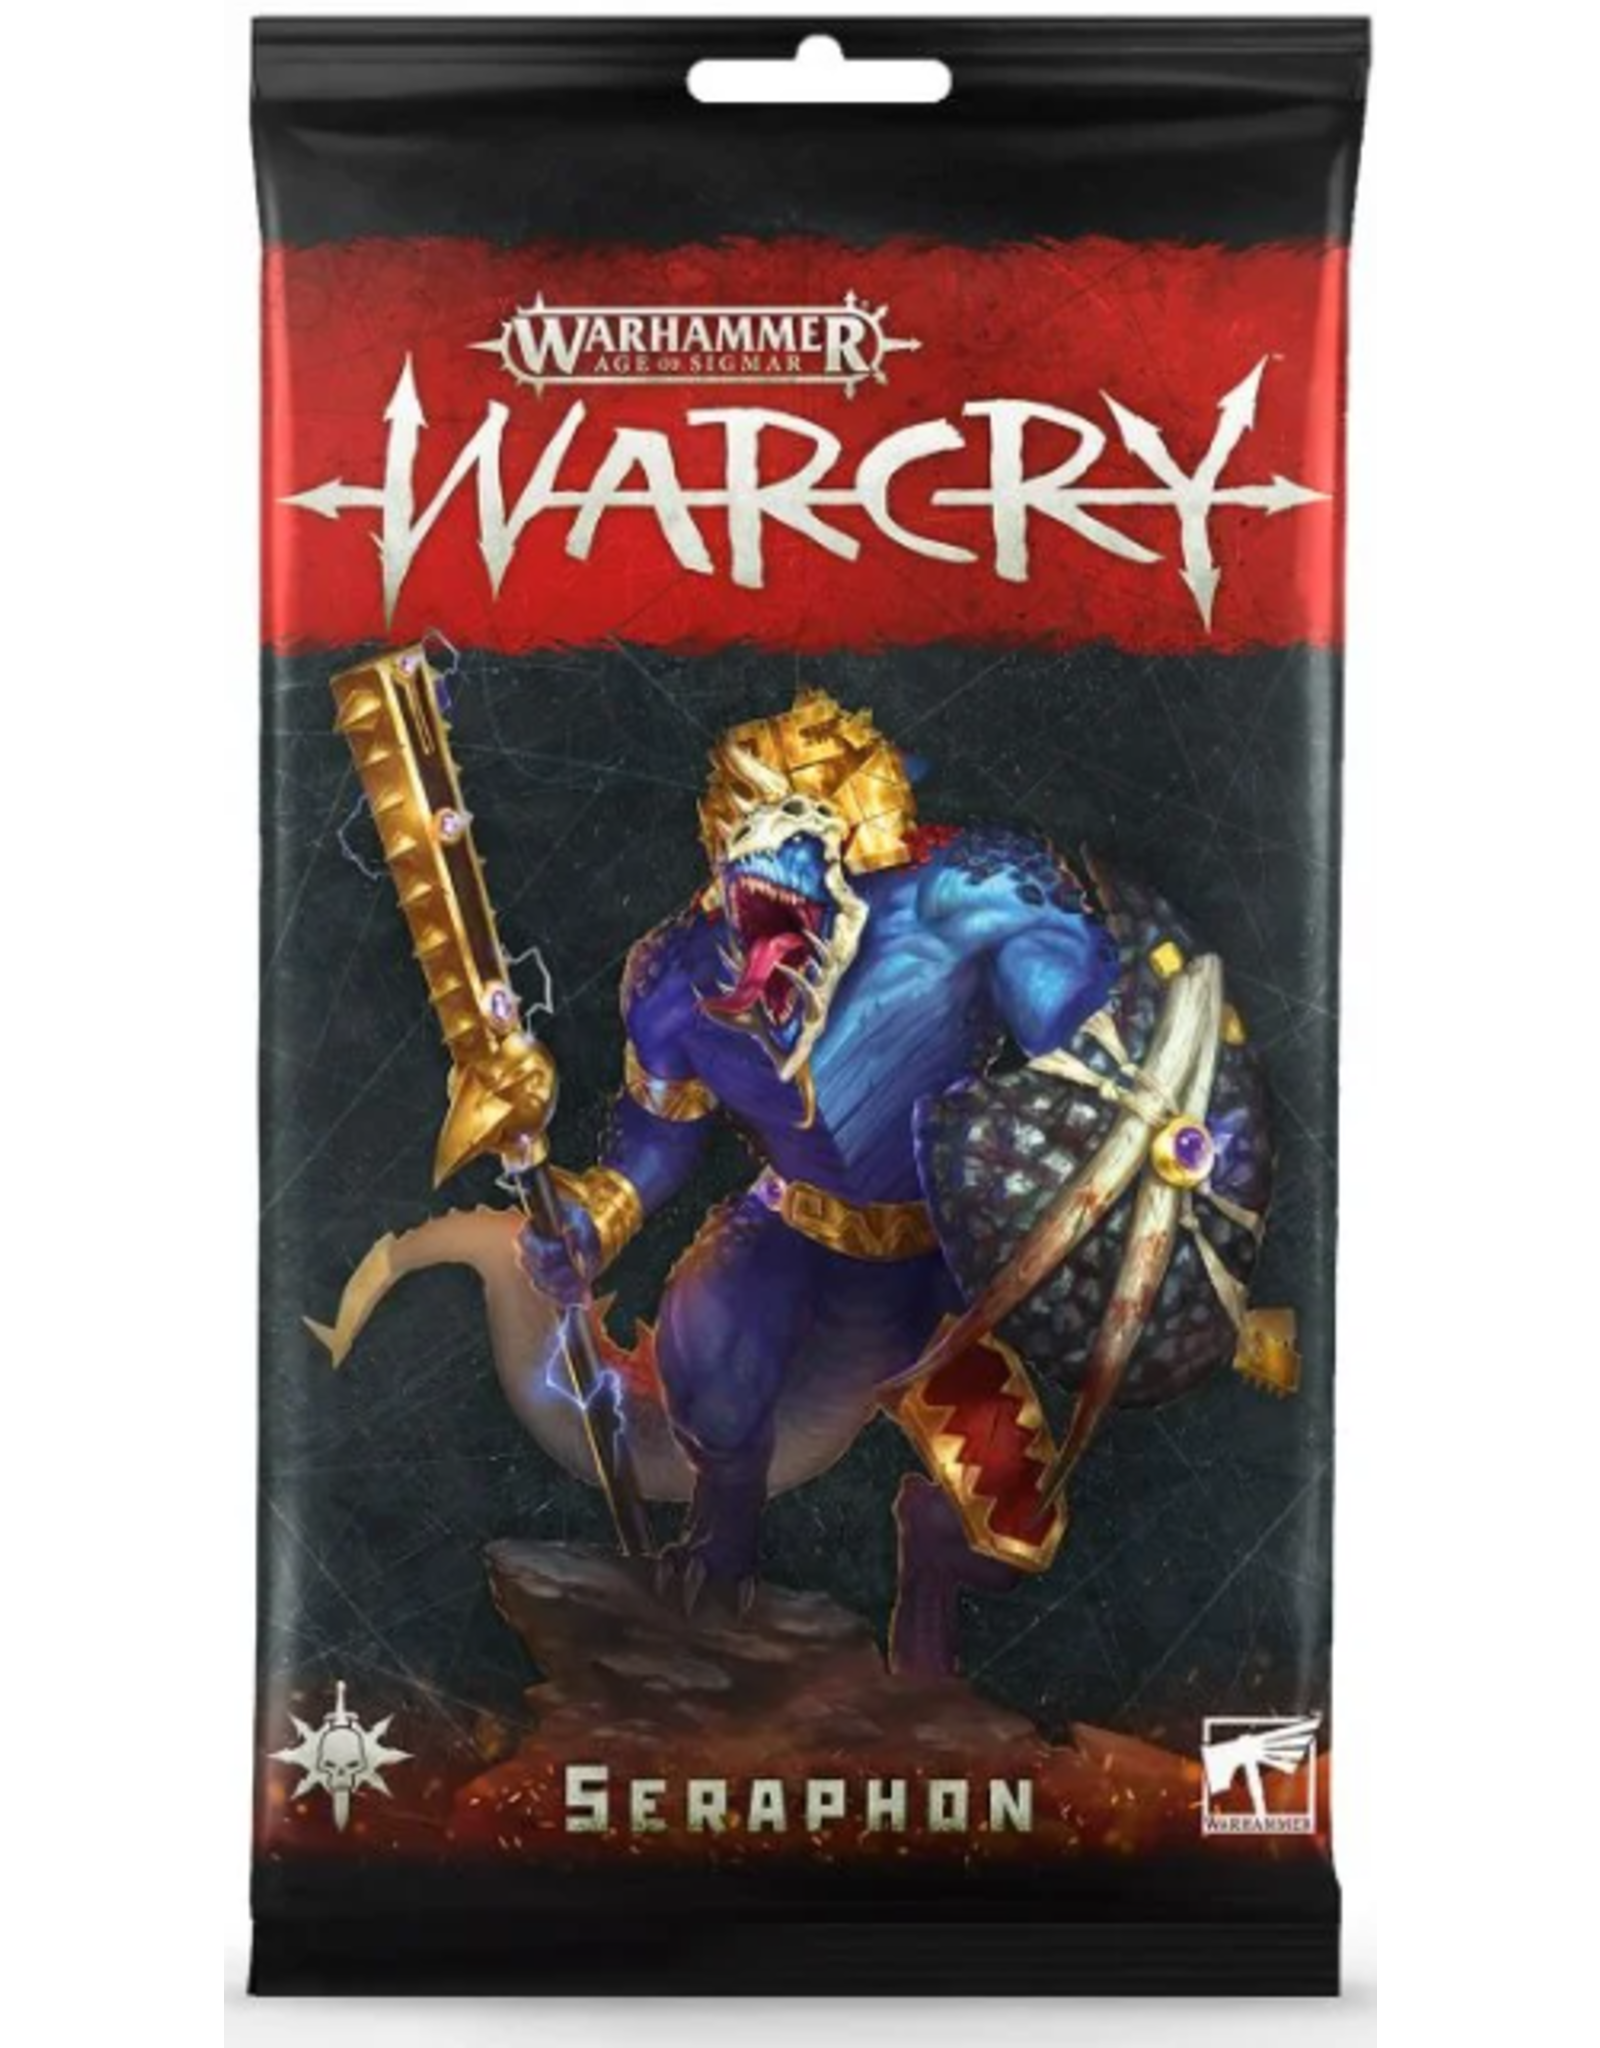 Games Workshop Warcry Seraphon Cards